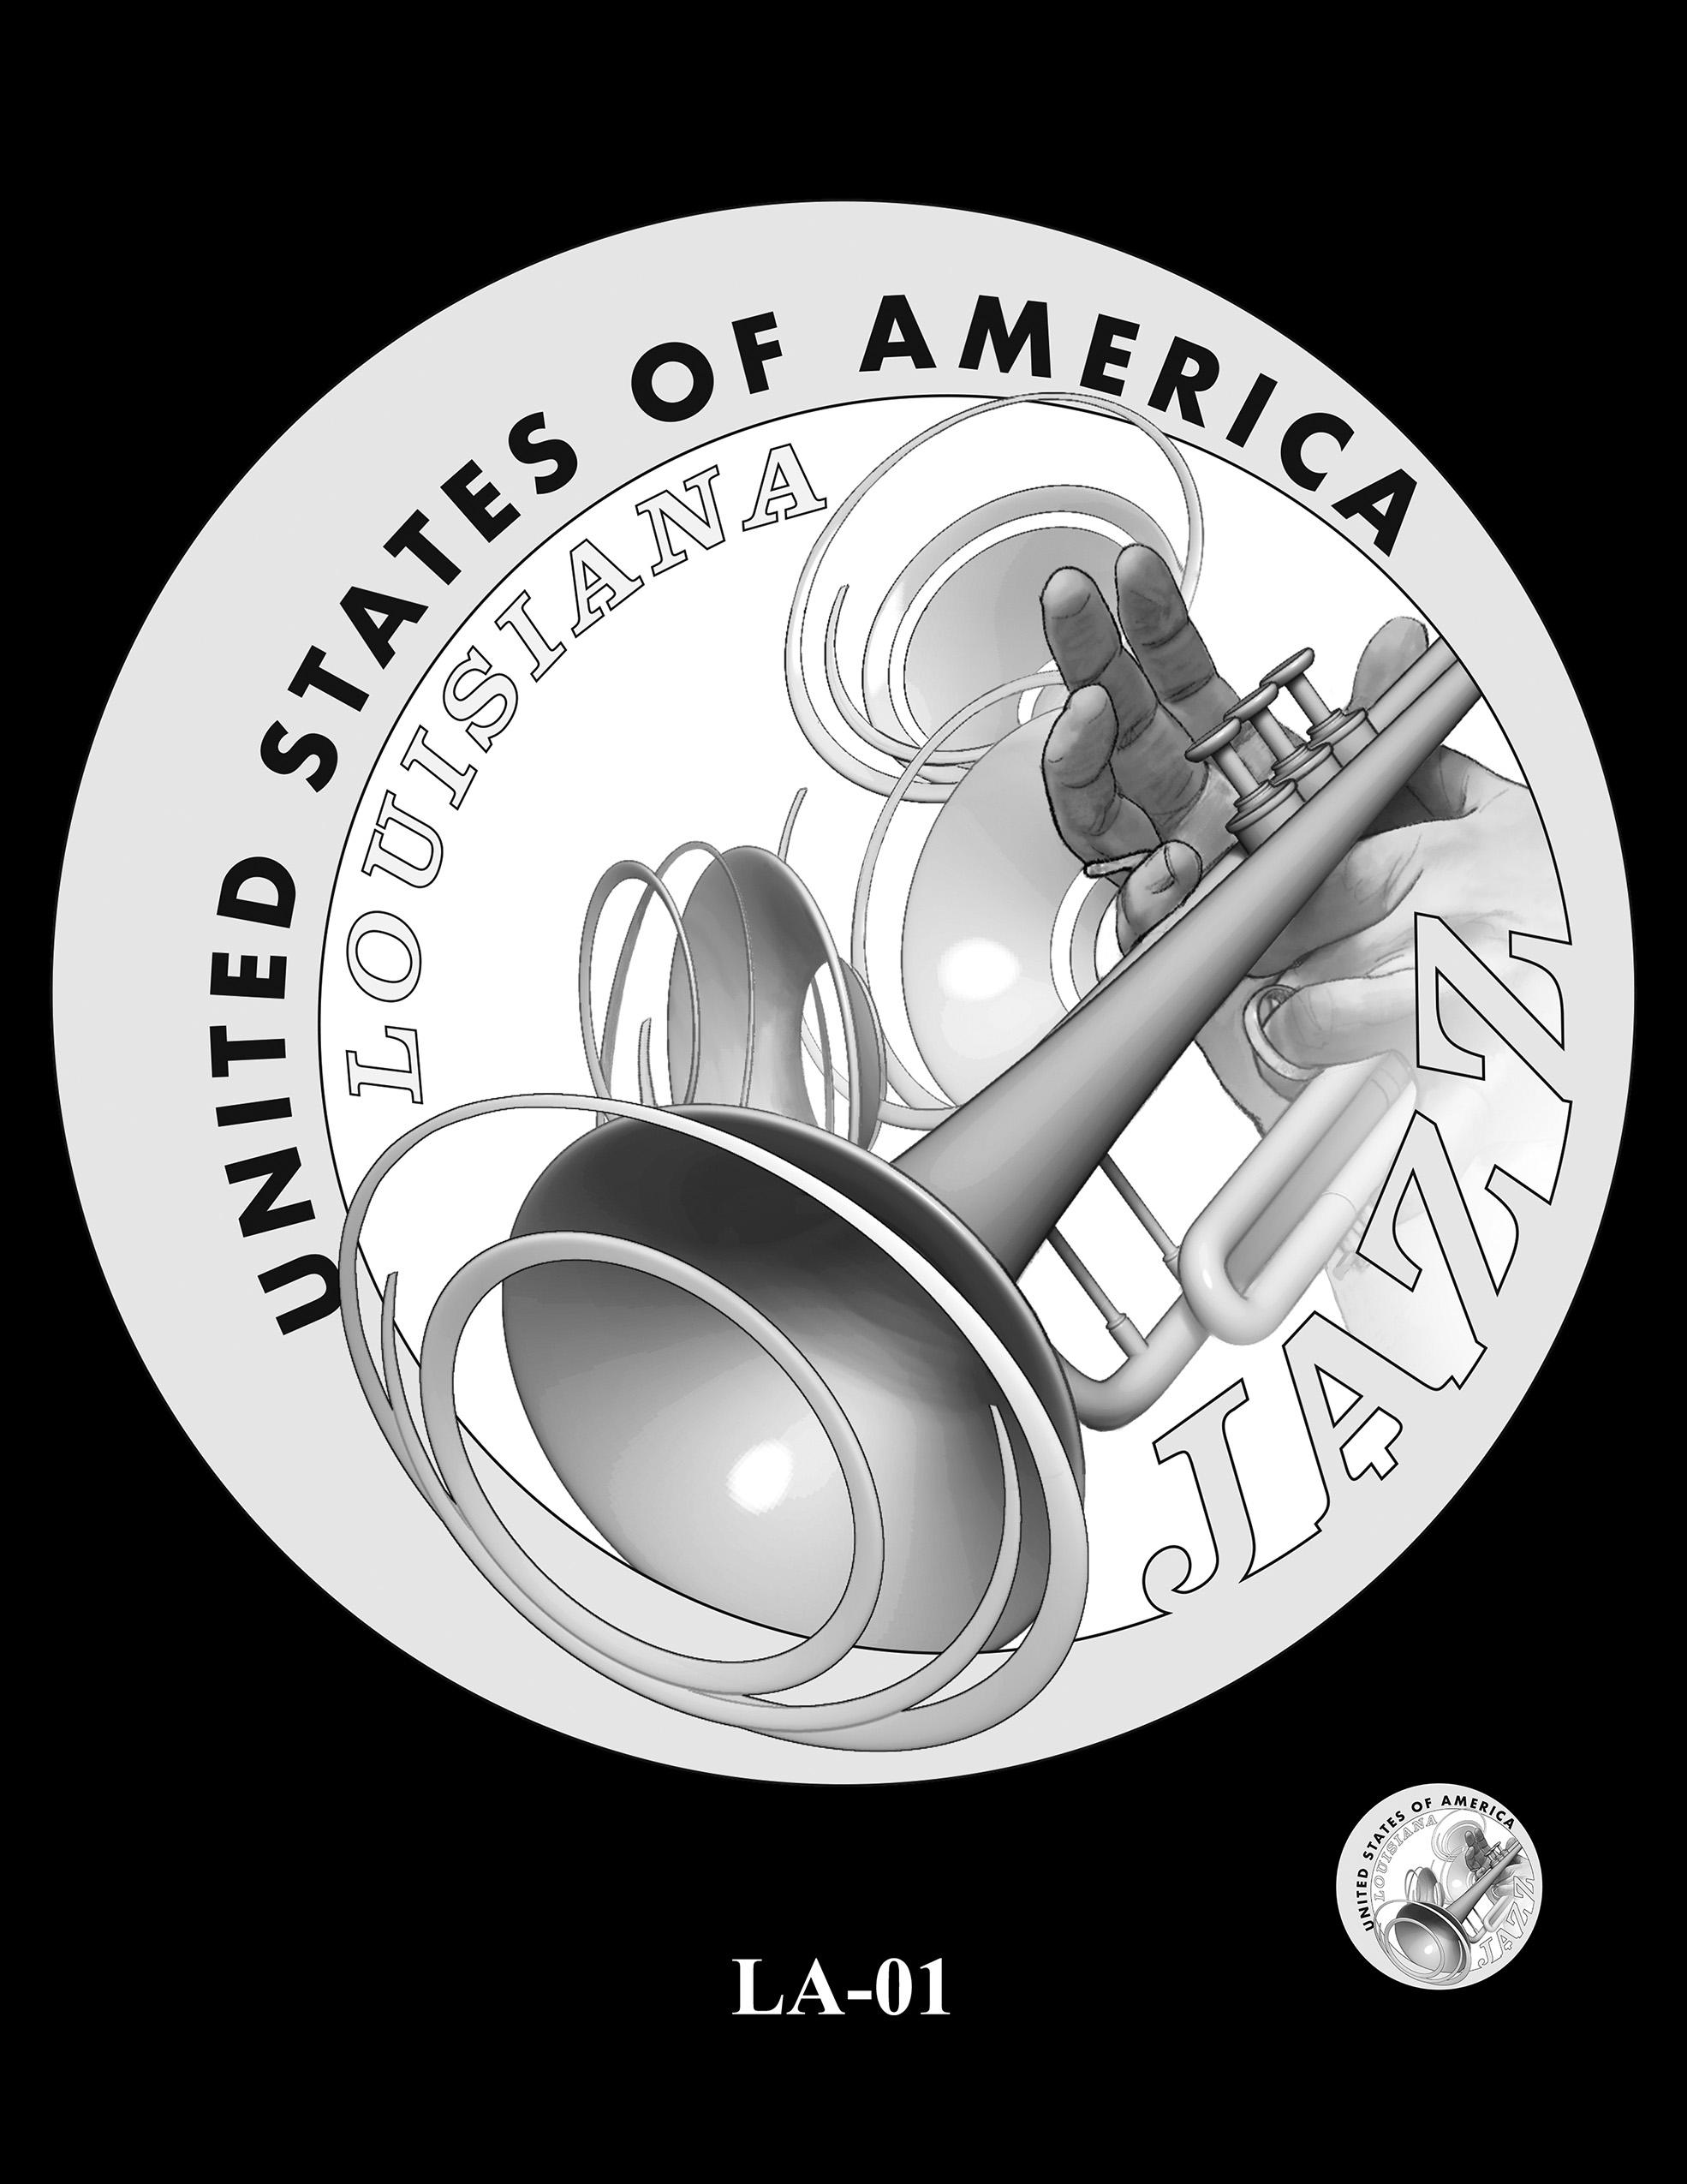 LA-01 -- 2023 American Innovation $1 Coin Program - Louisiana